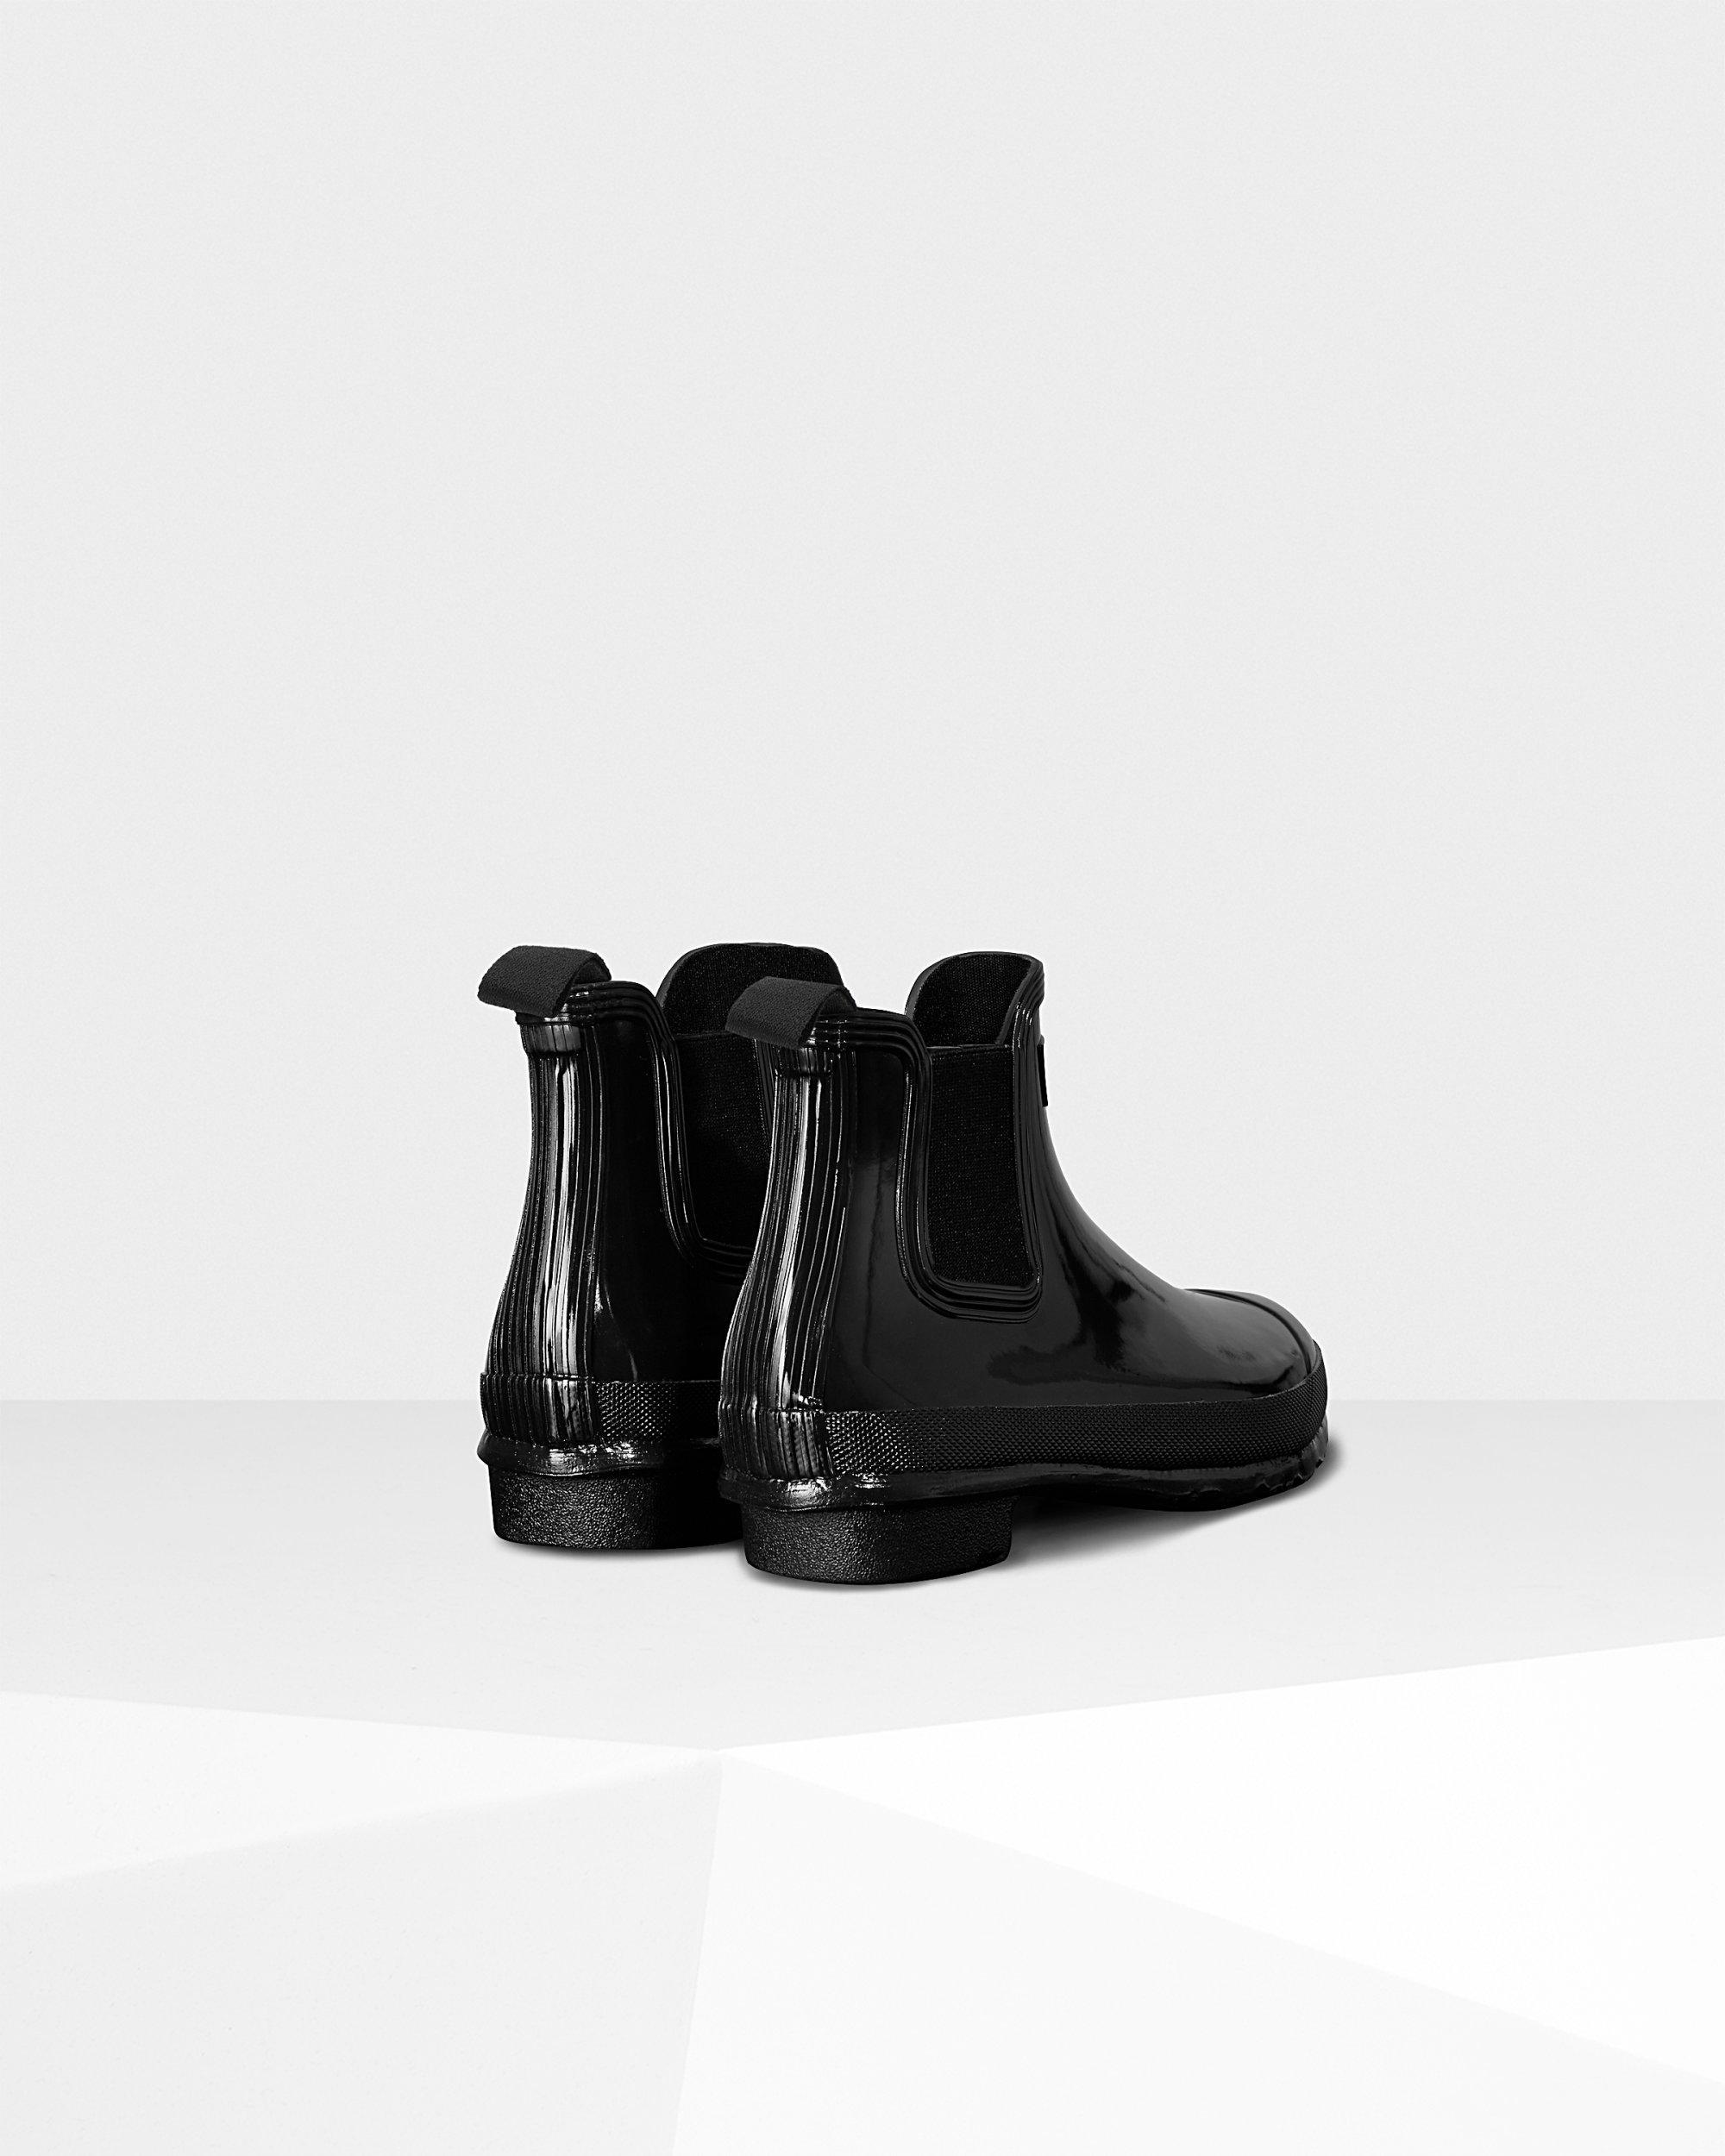 4b976fed4b4 Black Women's Original Gloss Chelsea Boots